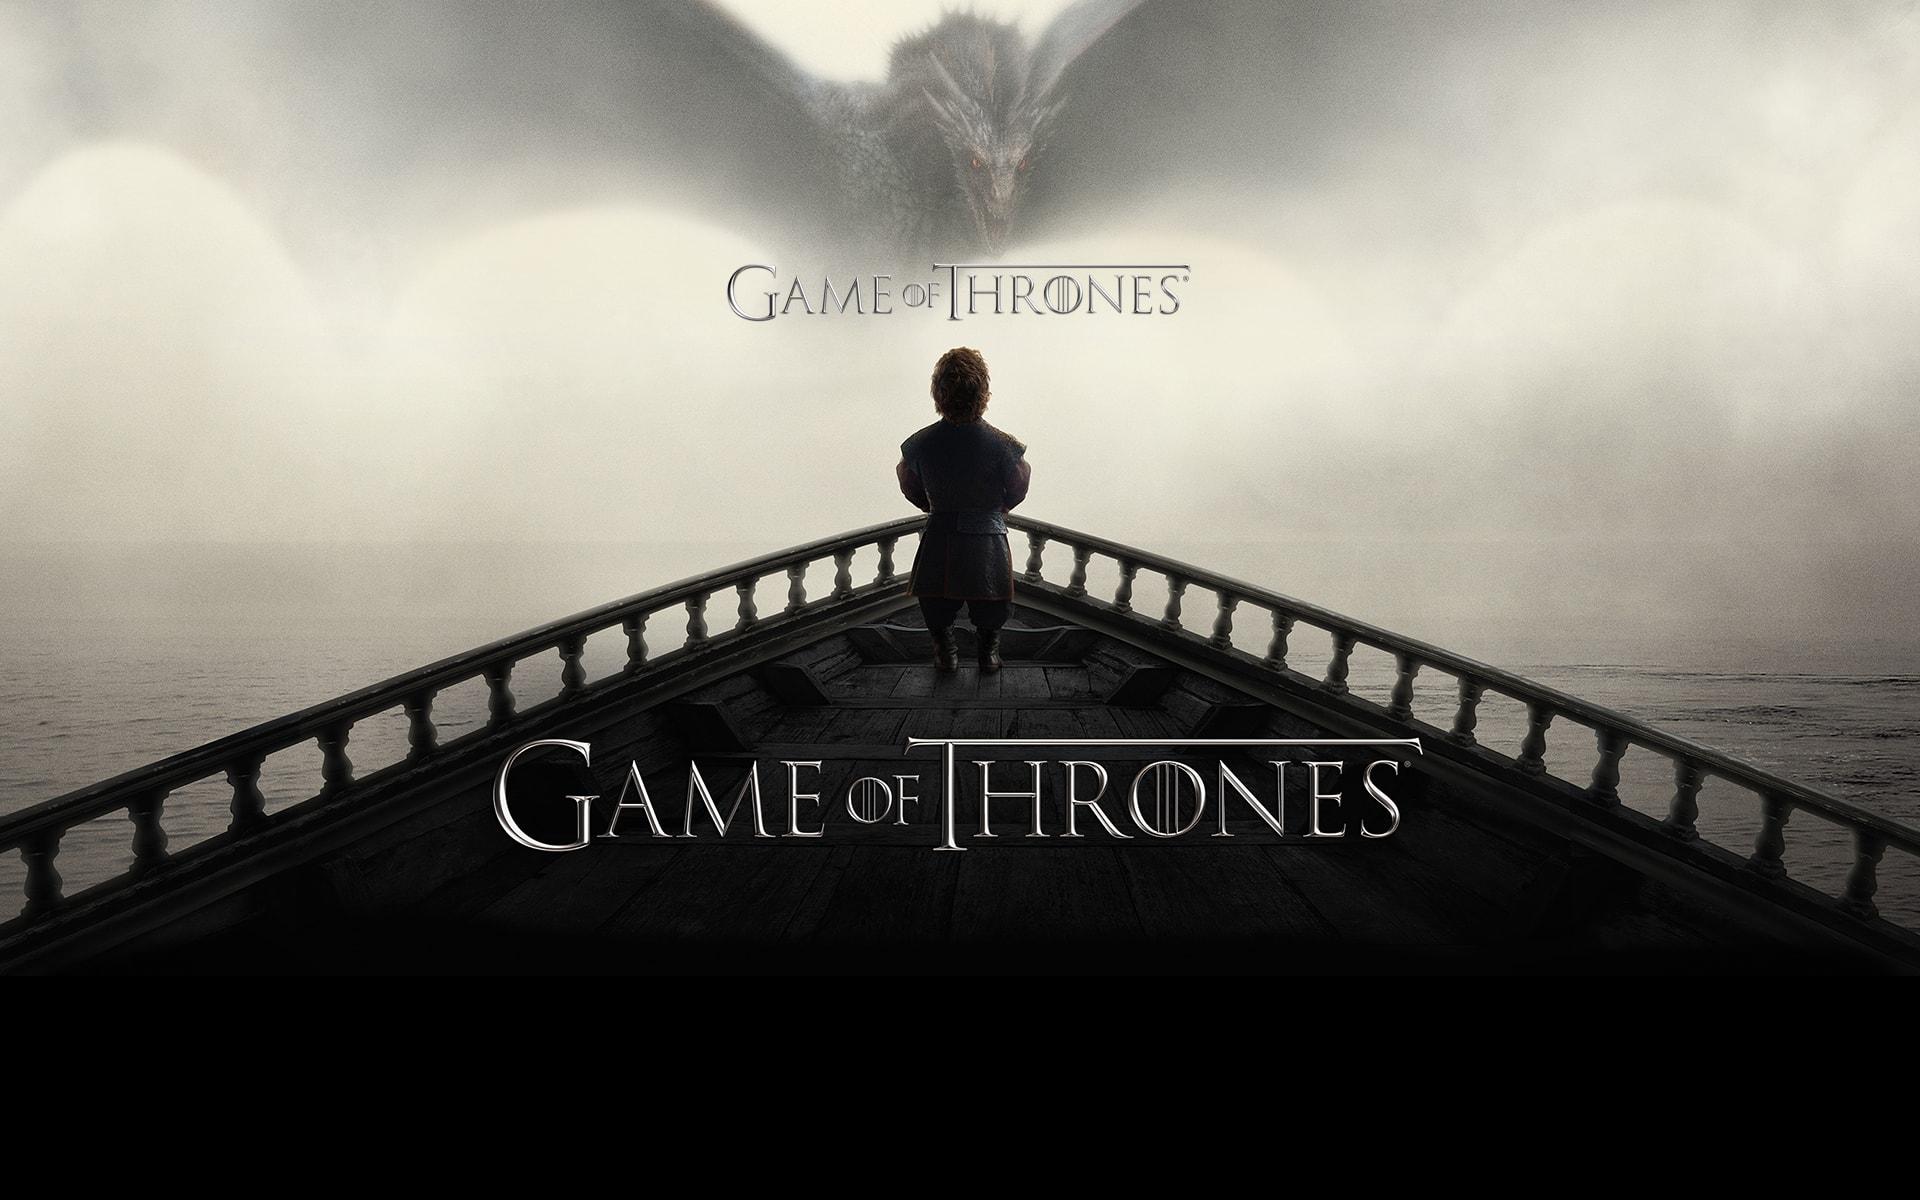 Game of thrones saison 5